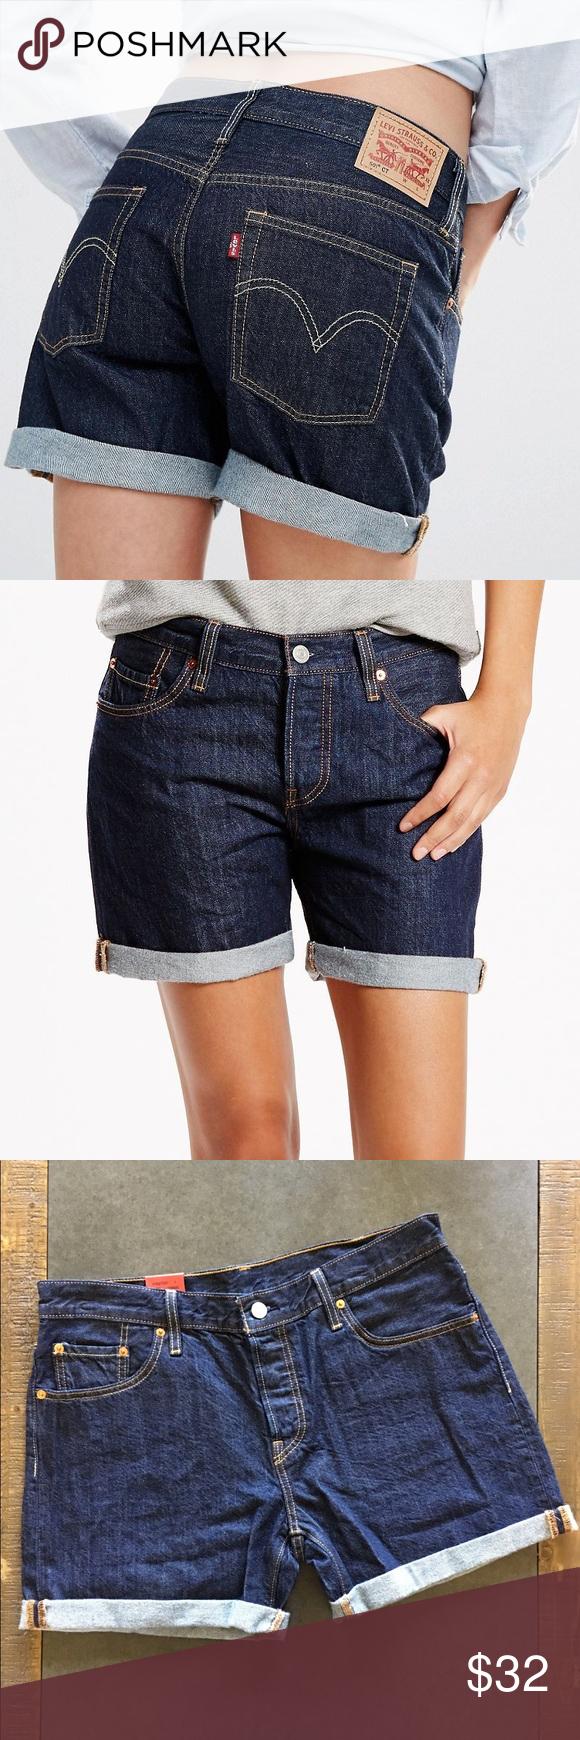 b4e21068 💋Women's Levi 501 CT Denim Shorts💋 NWT. My fav jeans in perfect denim